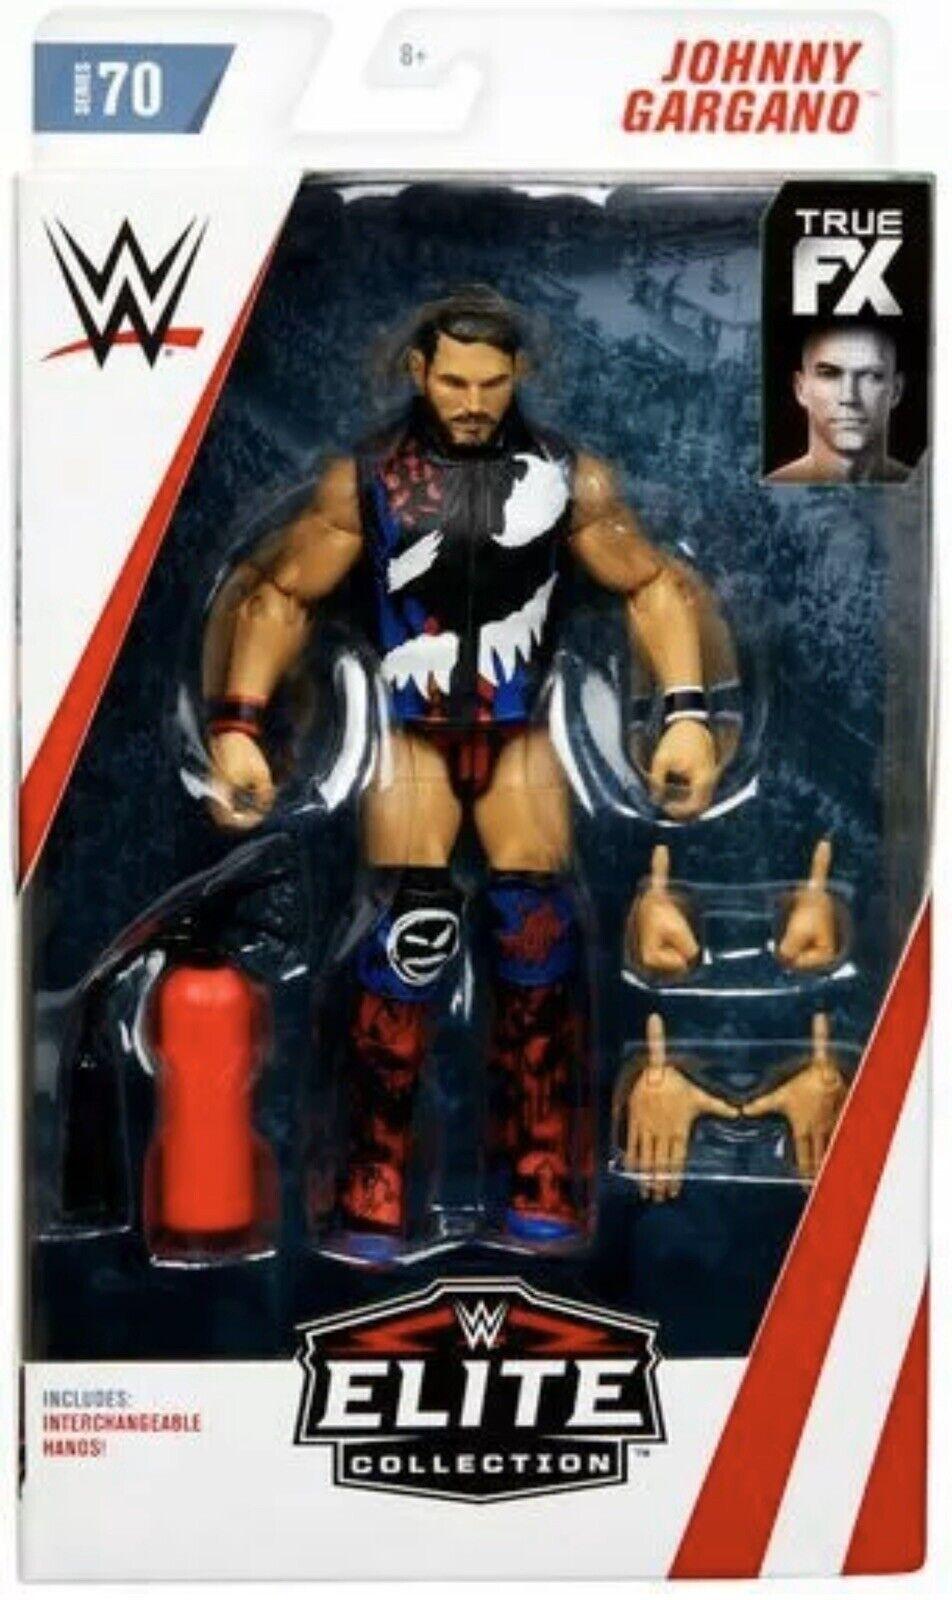 Wwe Johnny Gargano Mattel Elite Serie 70 Wrestling cifra Azione Nxt Wwf Nuovo